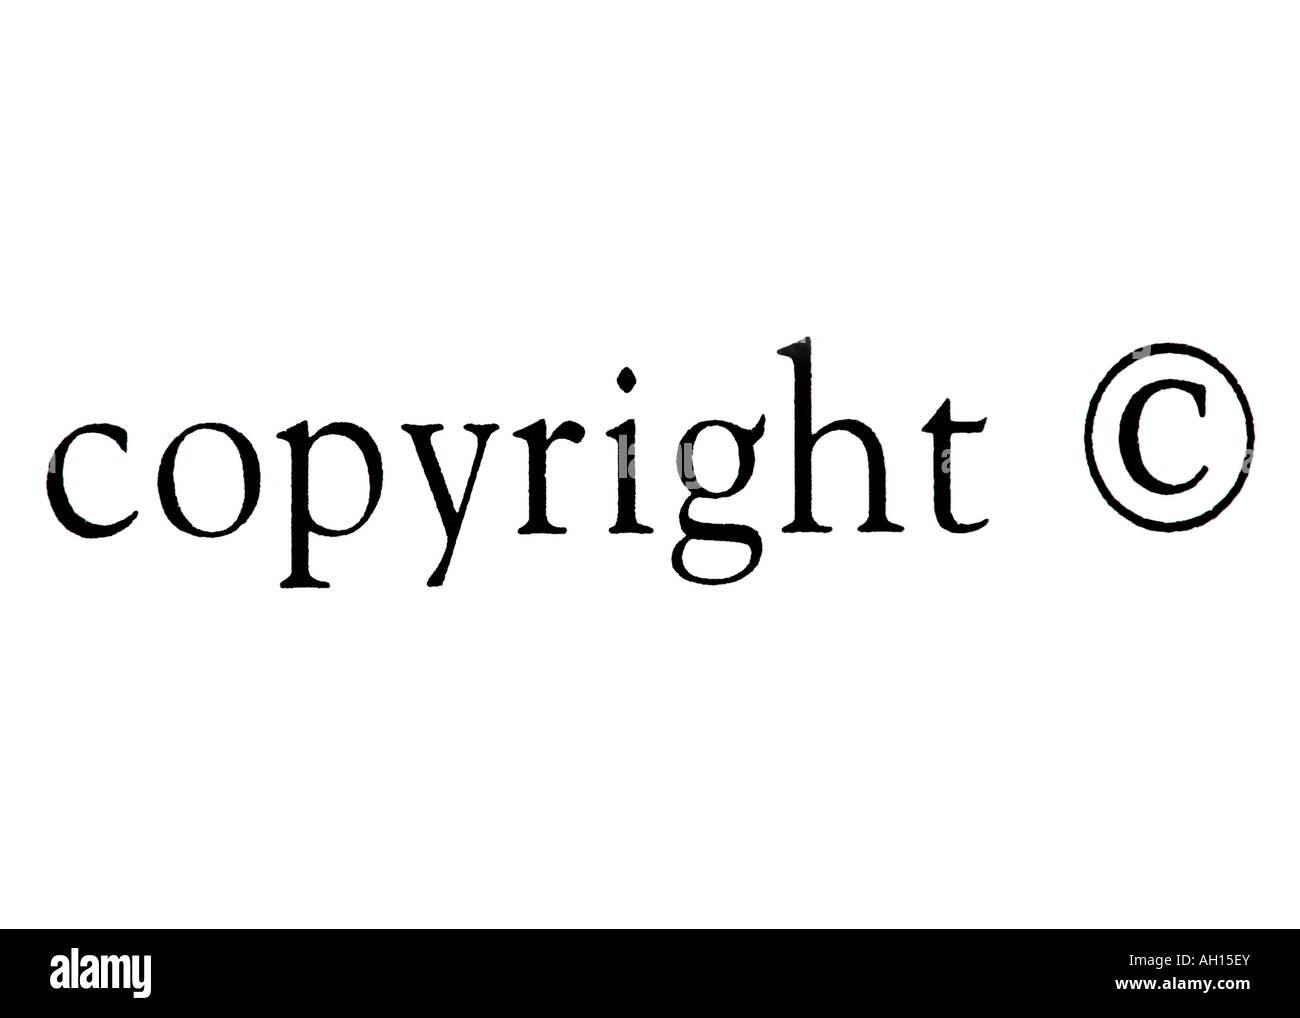 Copyright! Foto Stock